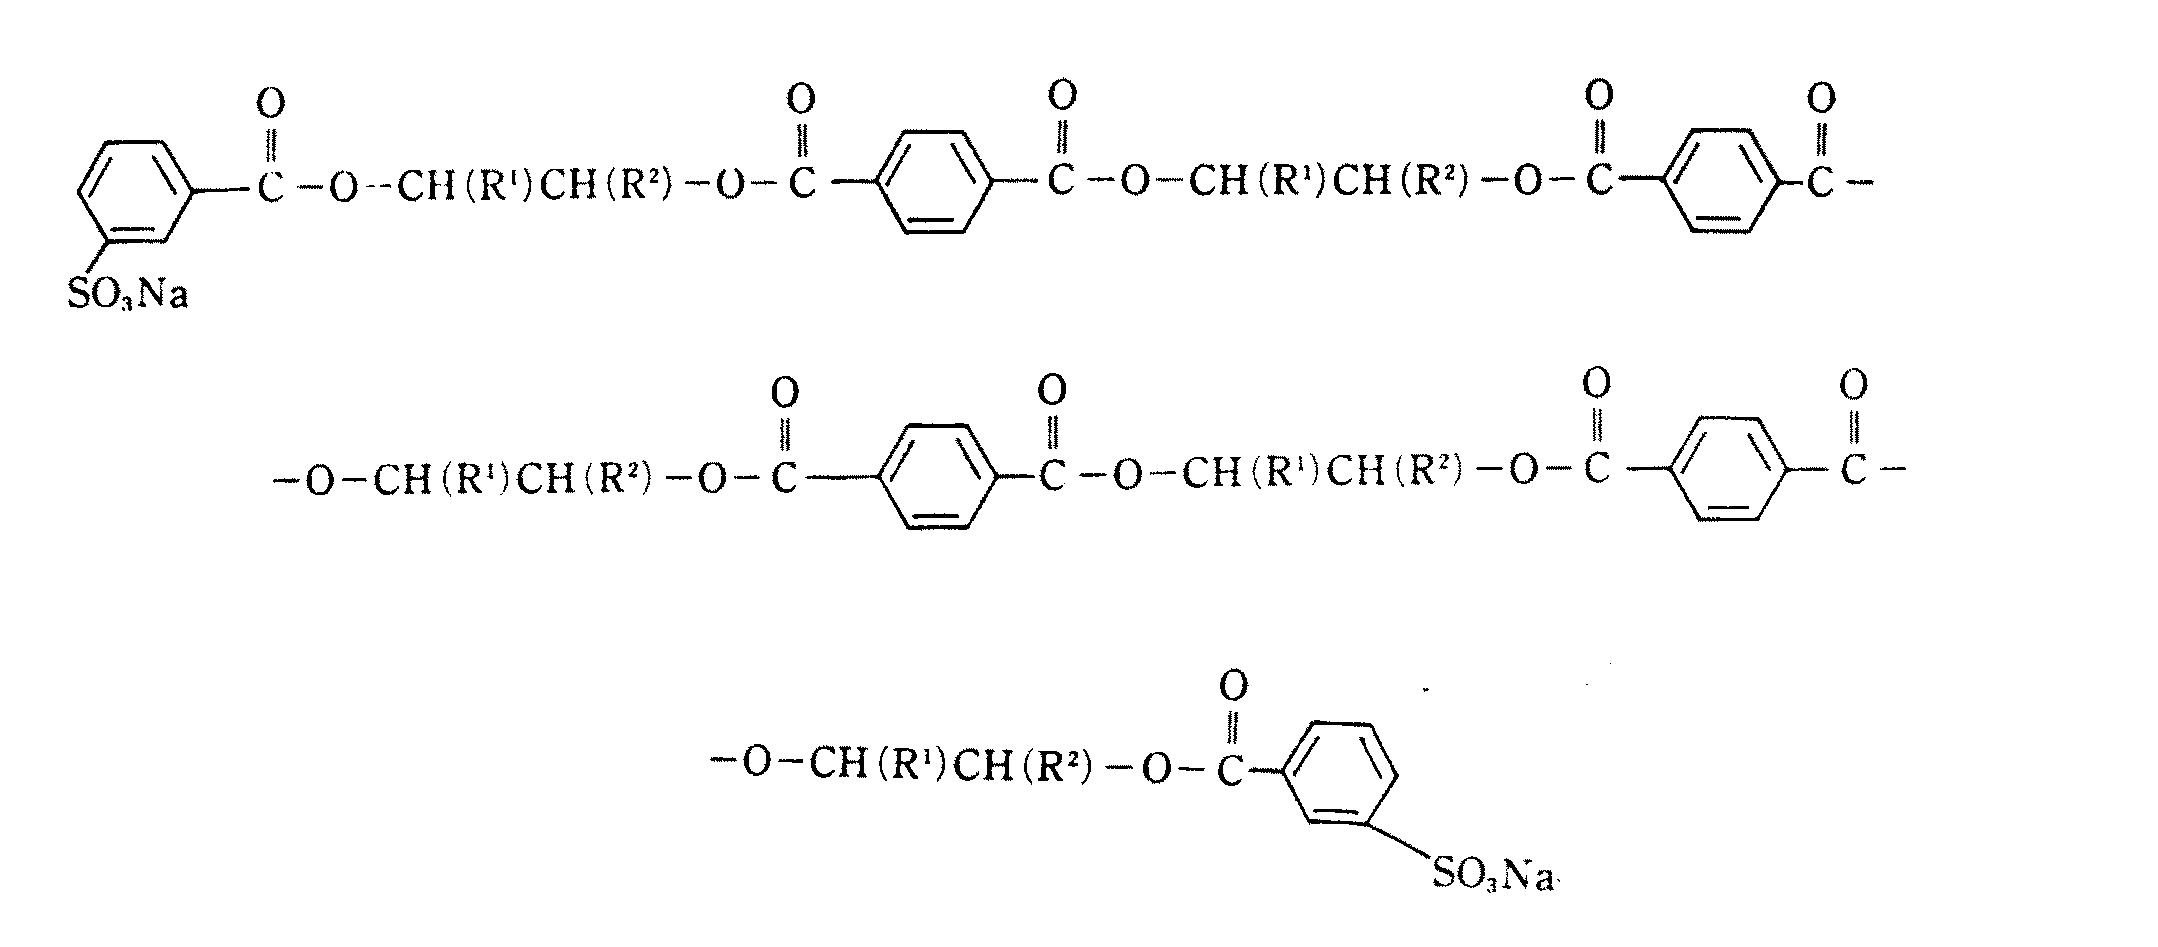 Figure kpo00002